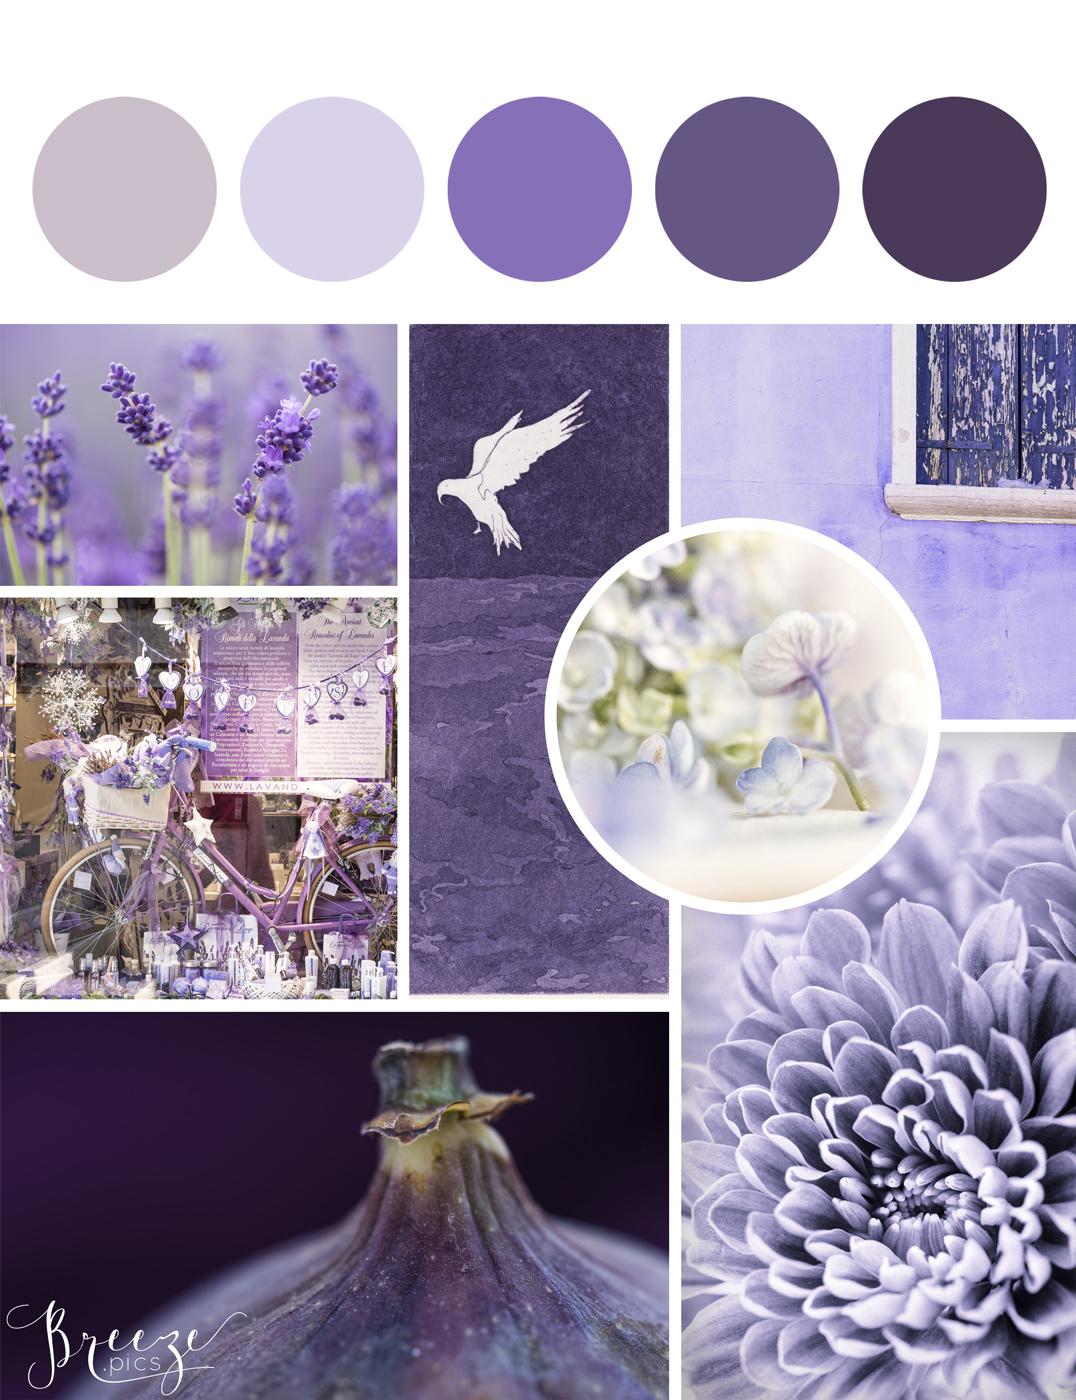 Purple mood board, creating a sanctuary at home, Breeze Pics